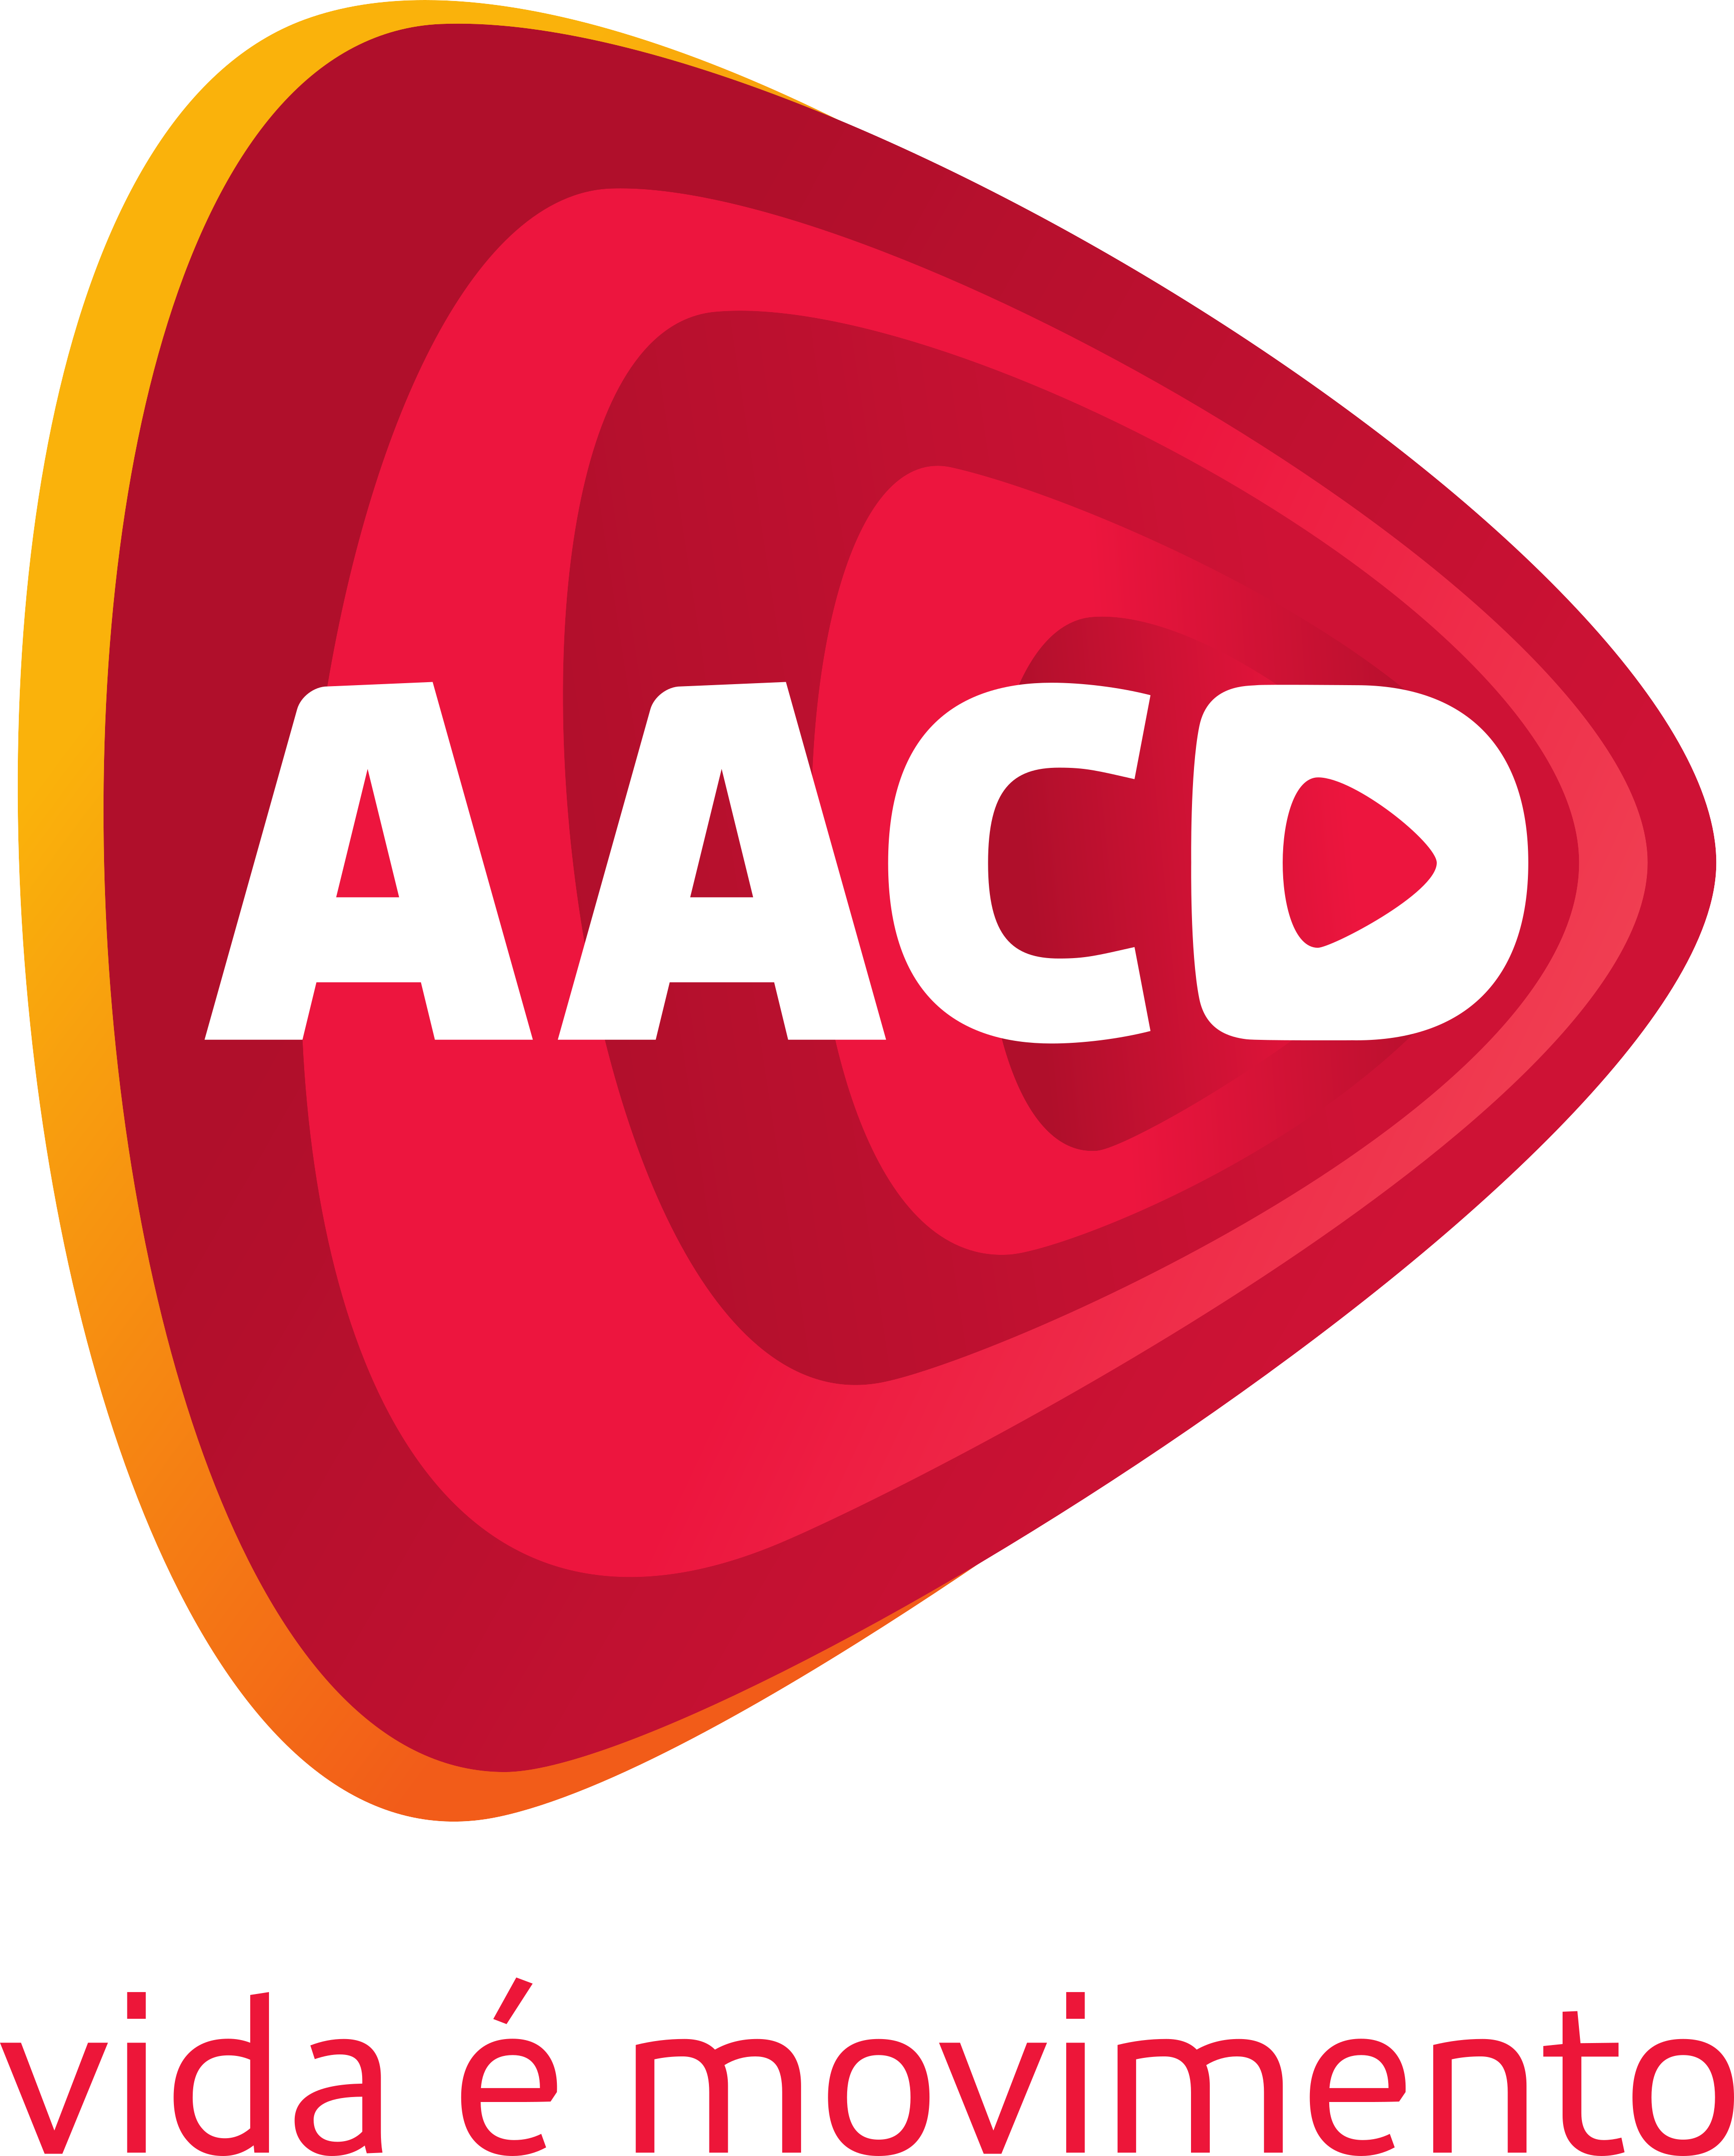 AACD Logo.